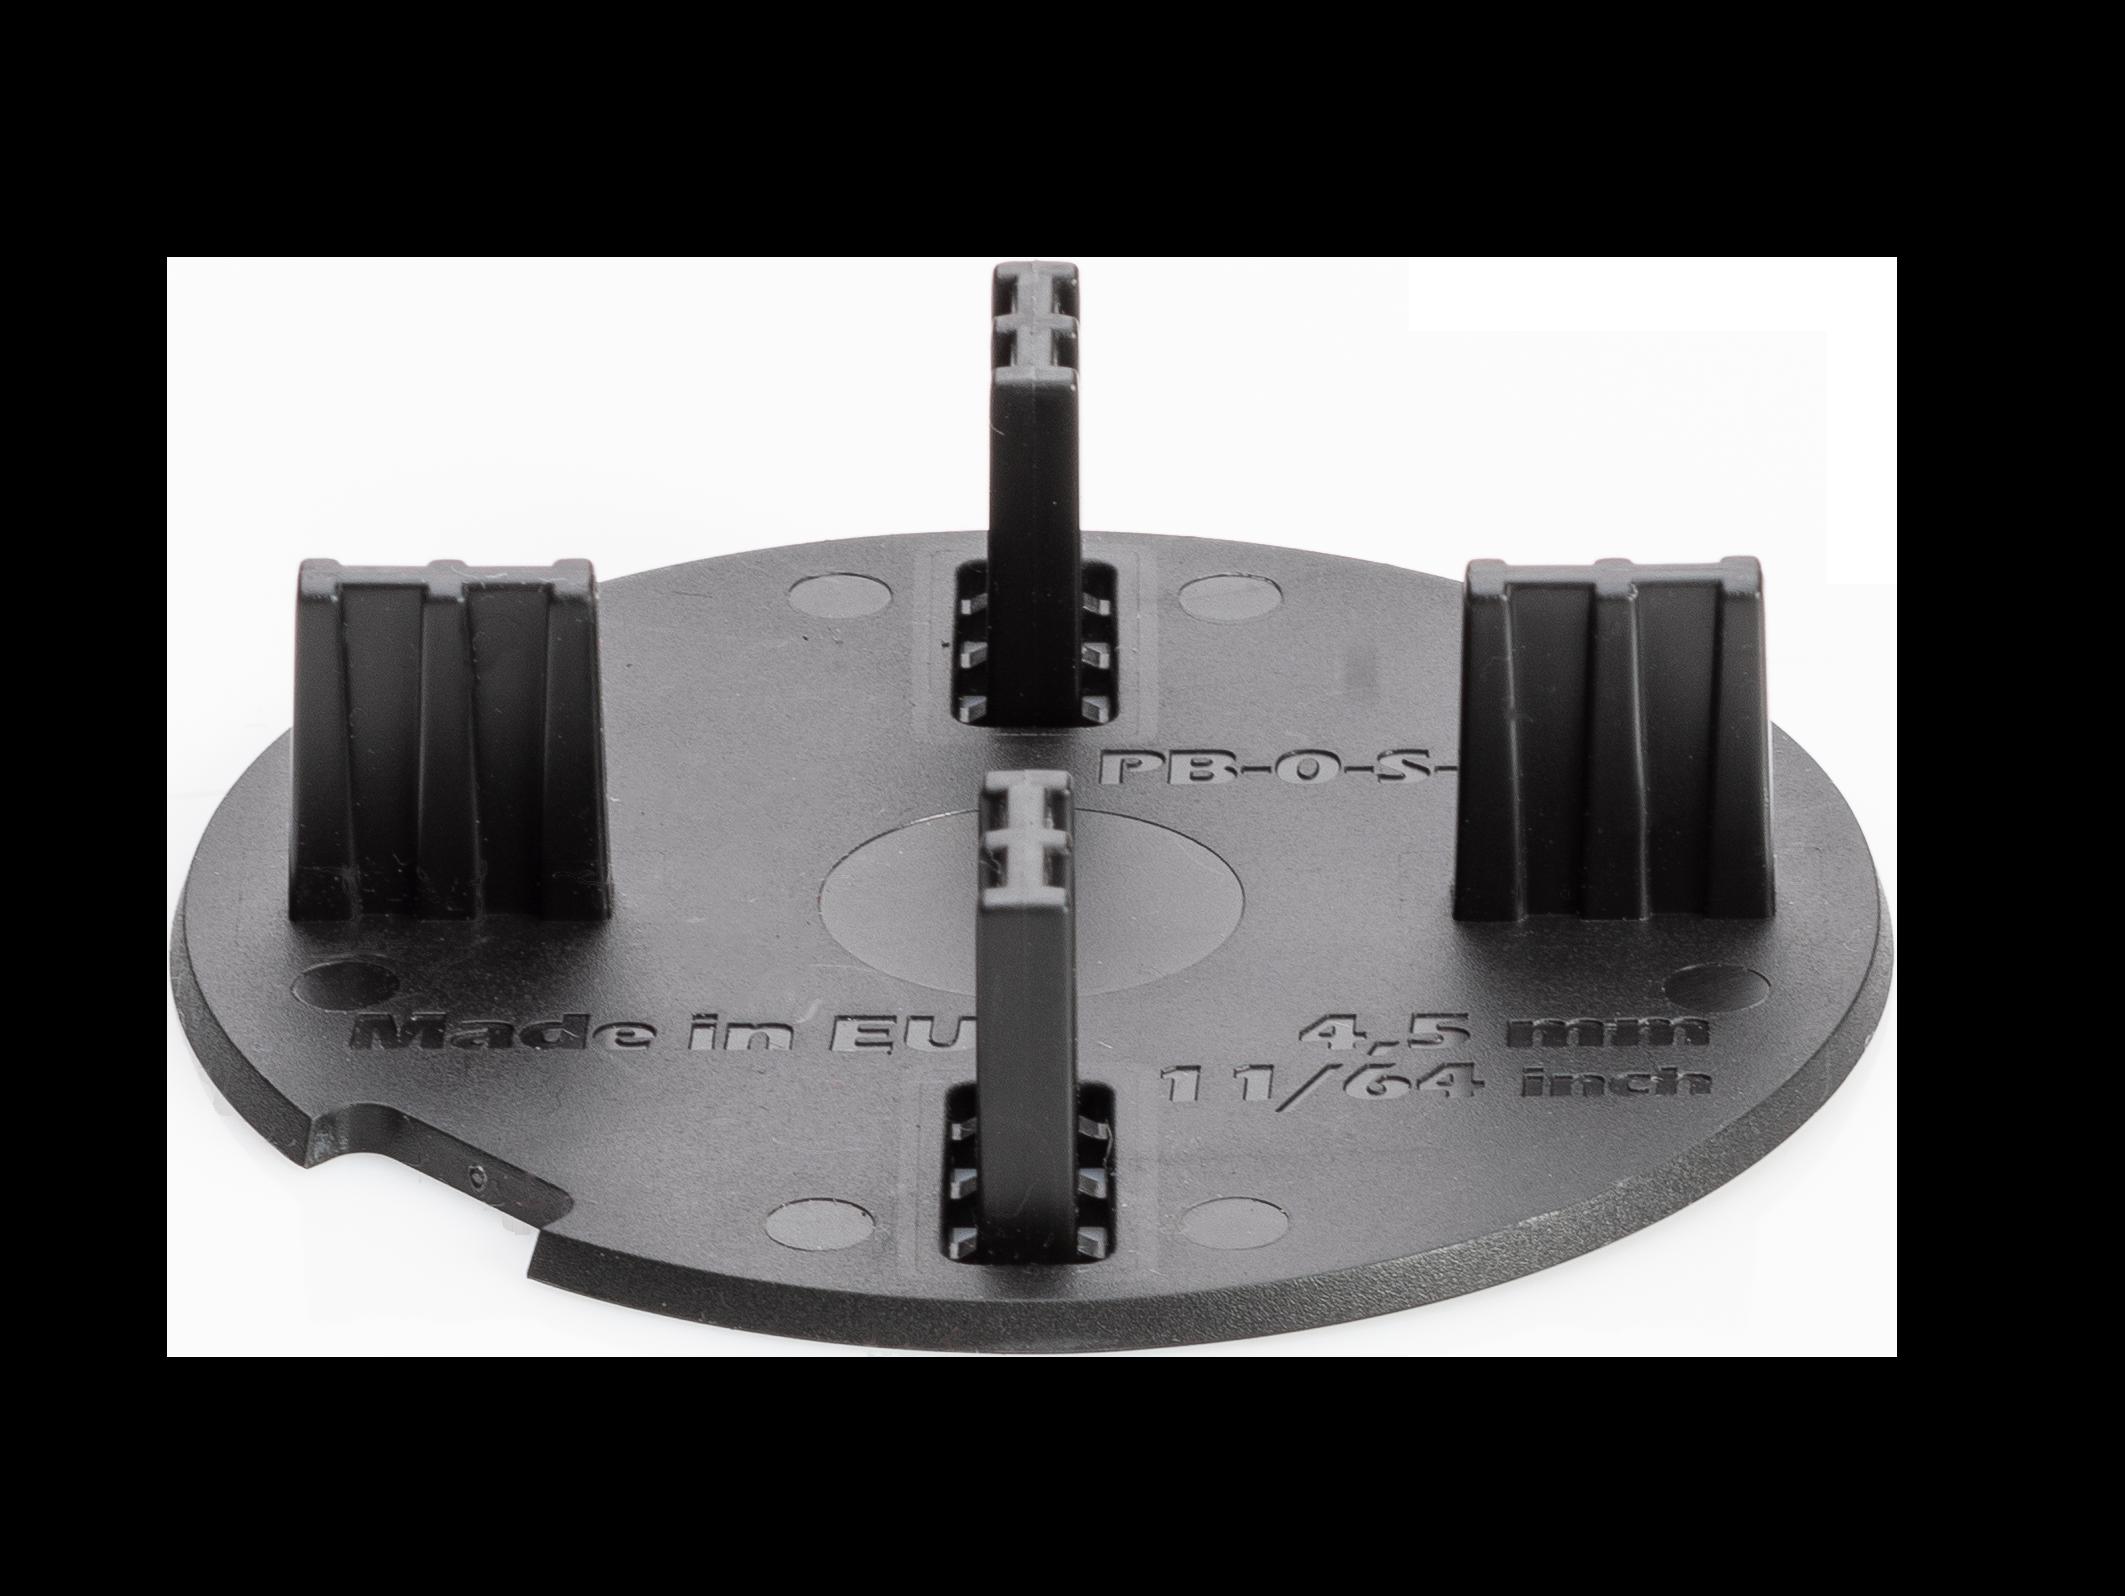 u-tabs-flat-4.5mm-adjustable-feet-for-decking - Buzon